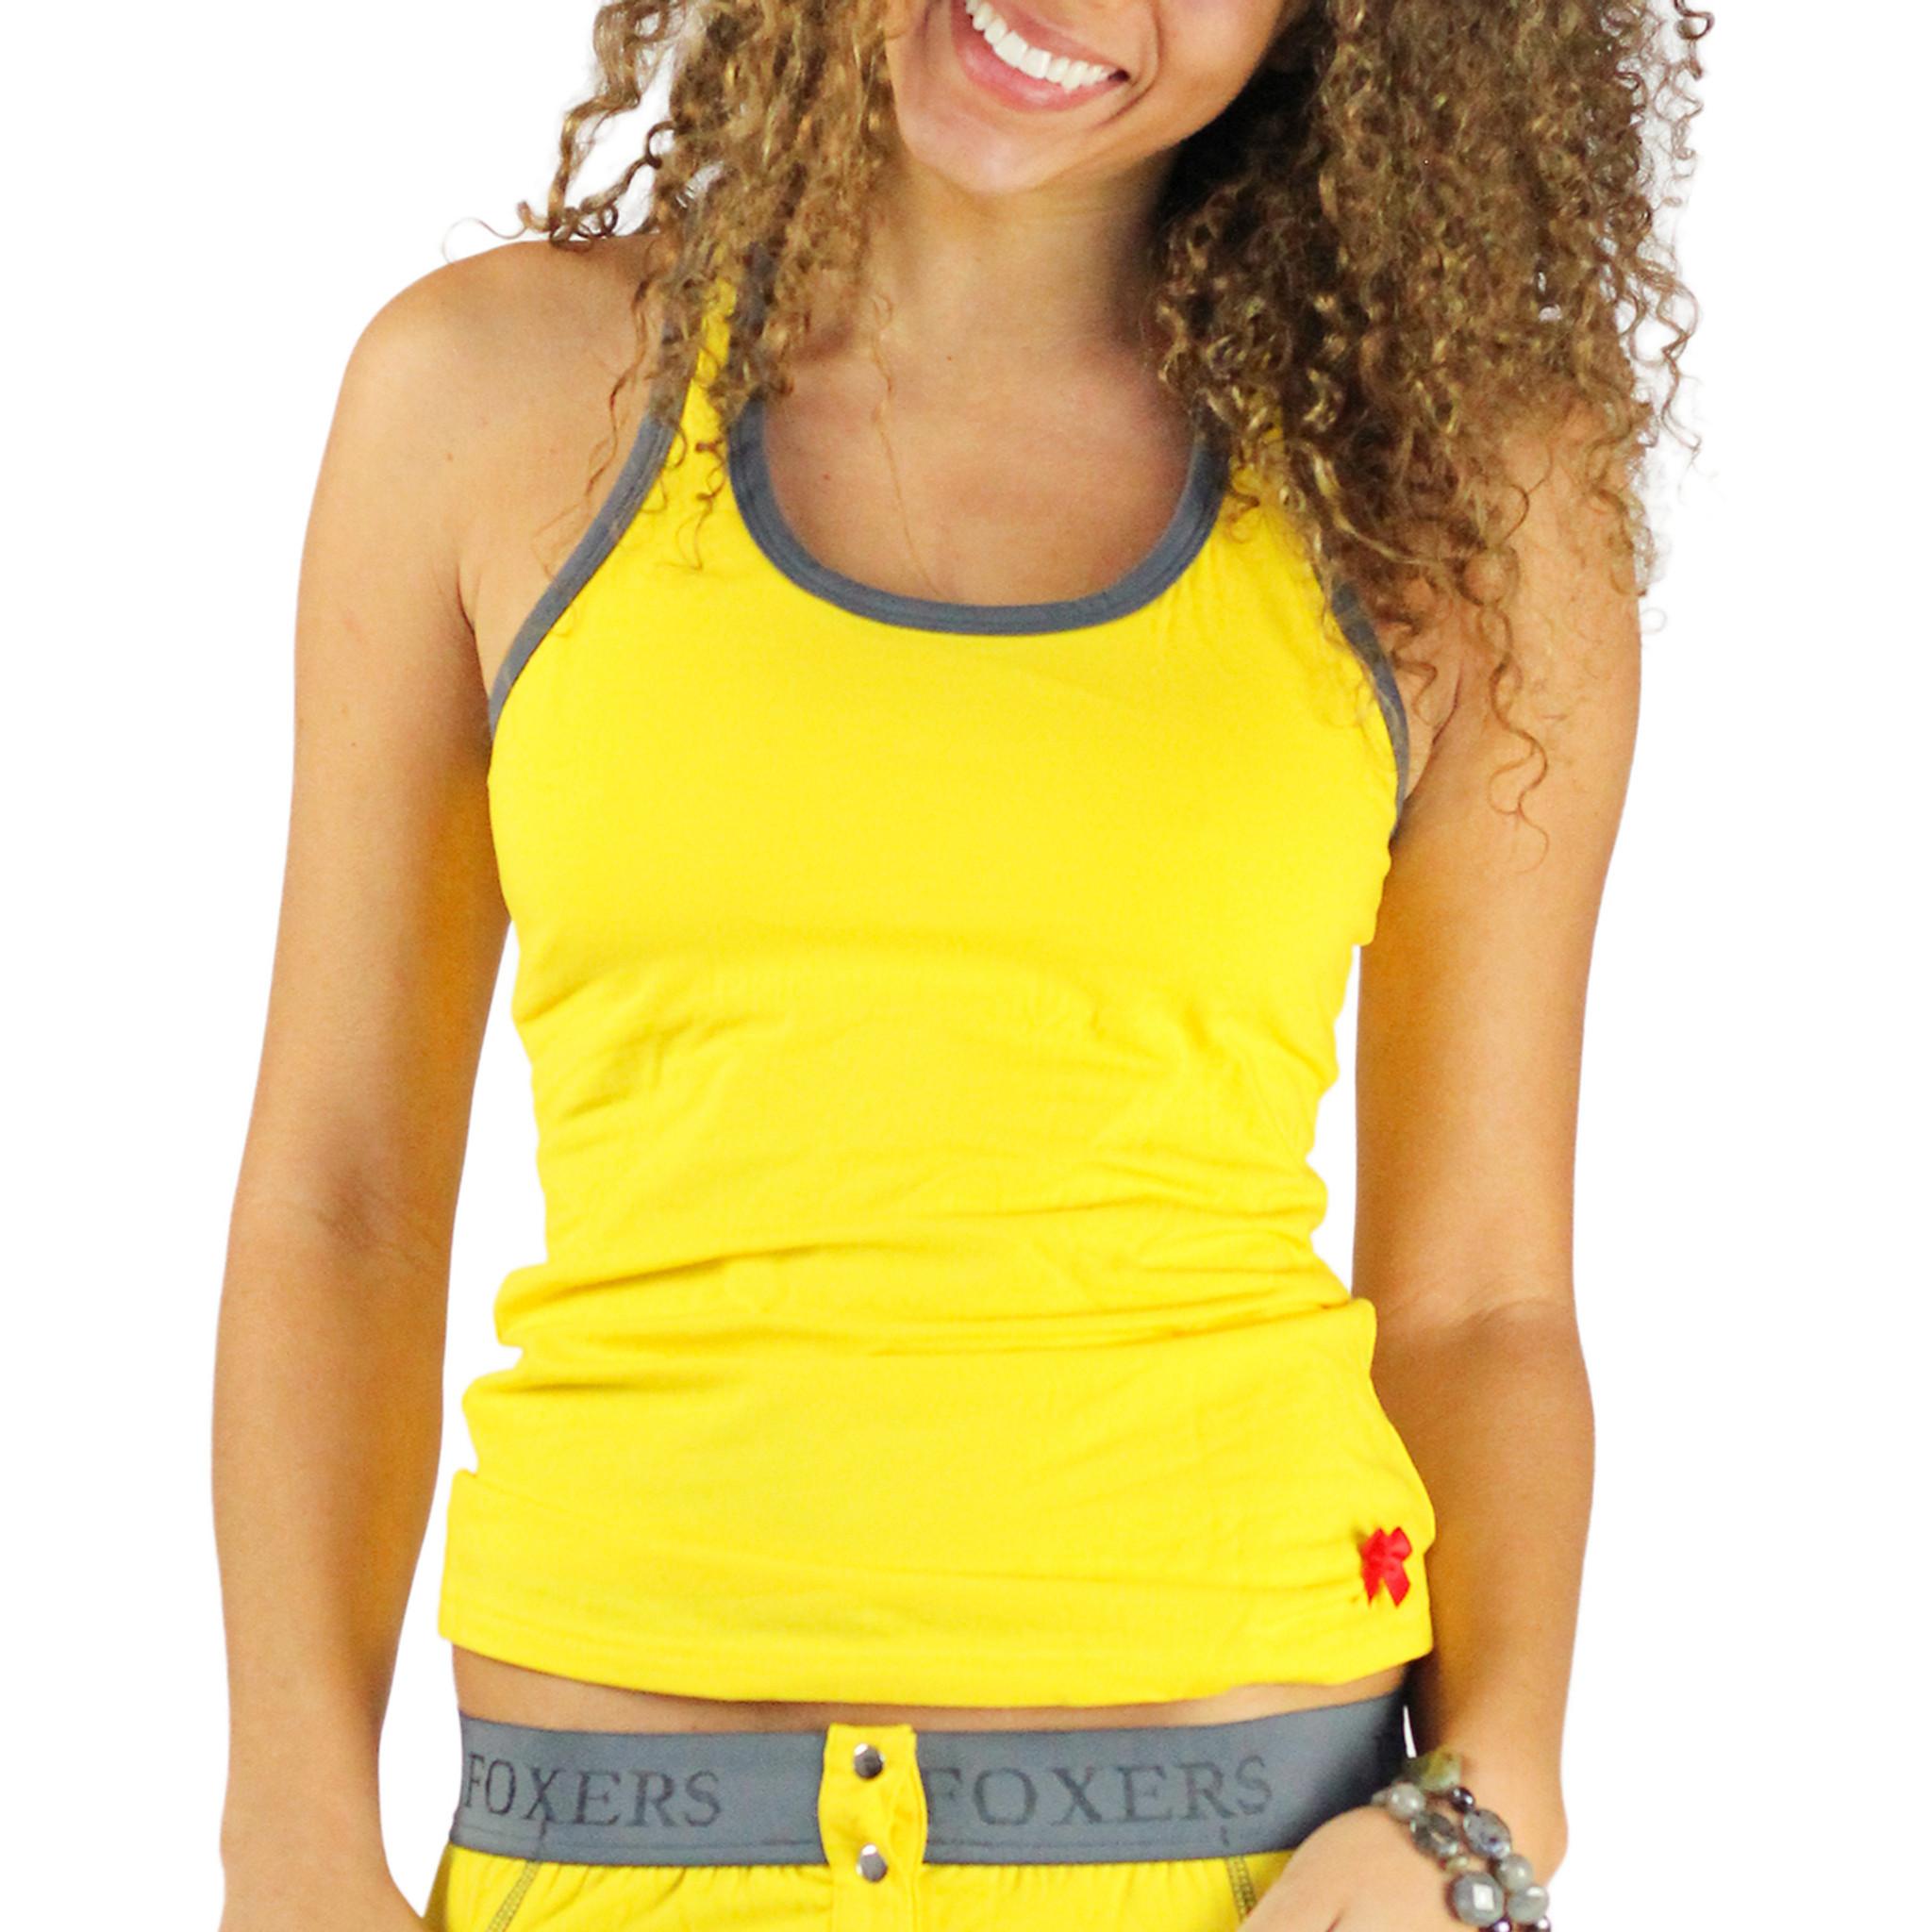 Sunshine yellow racerback tank with gray trim shelf bra for Racerback t shirt bra